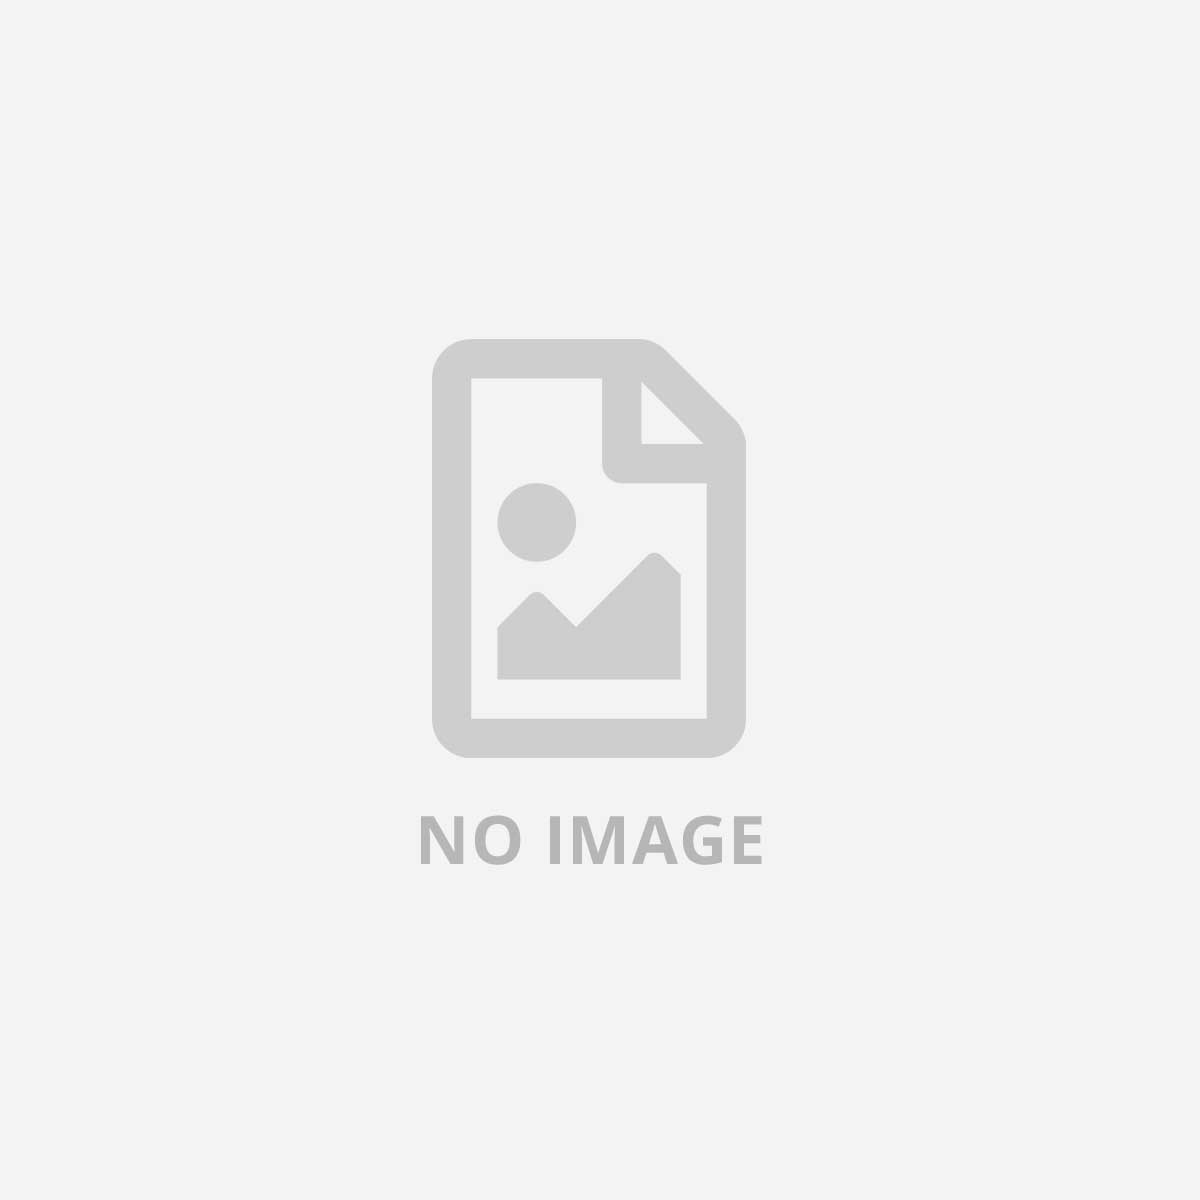 AMD 10-SERIES 3500MHZ 4 CORE